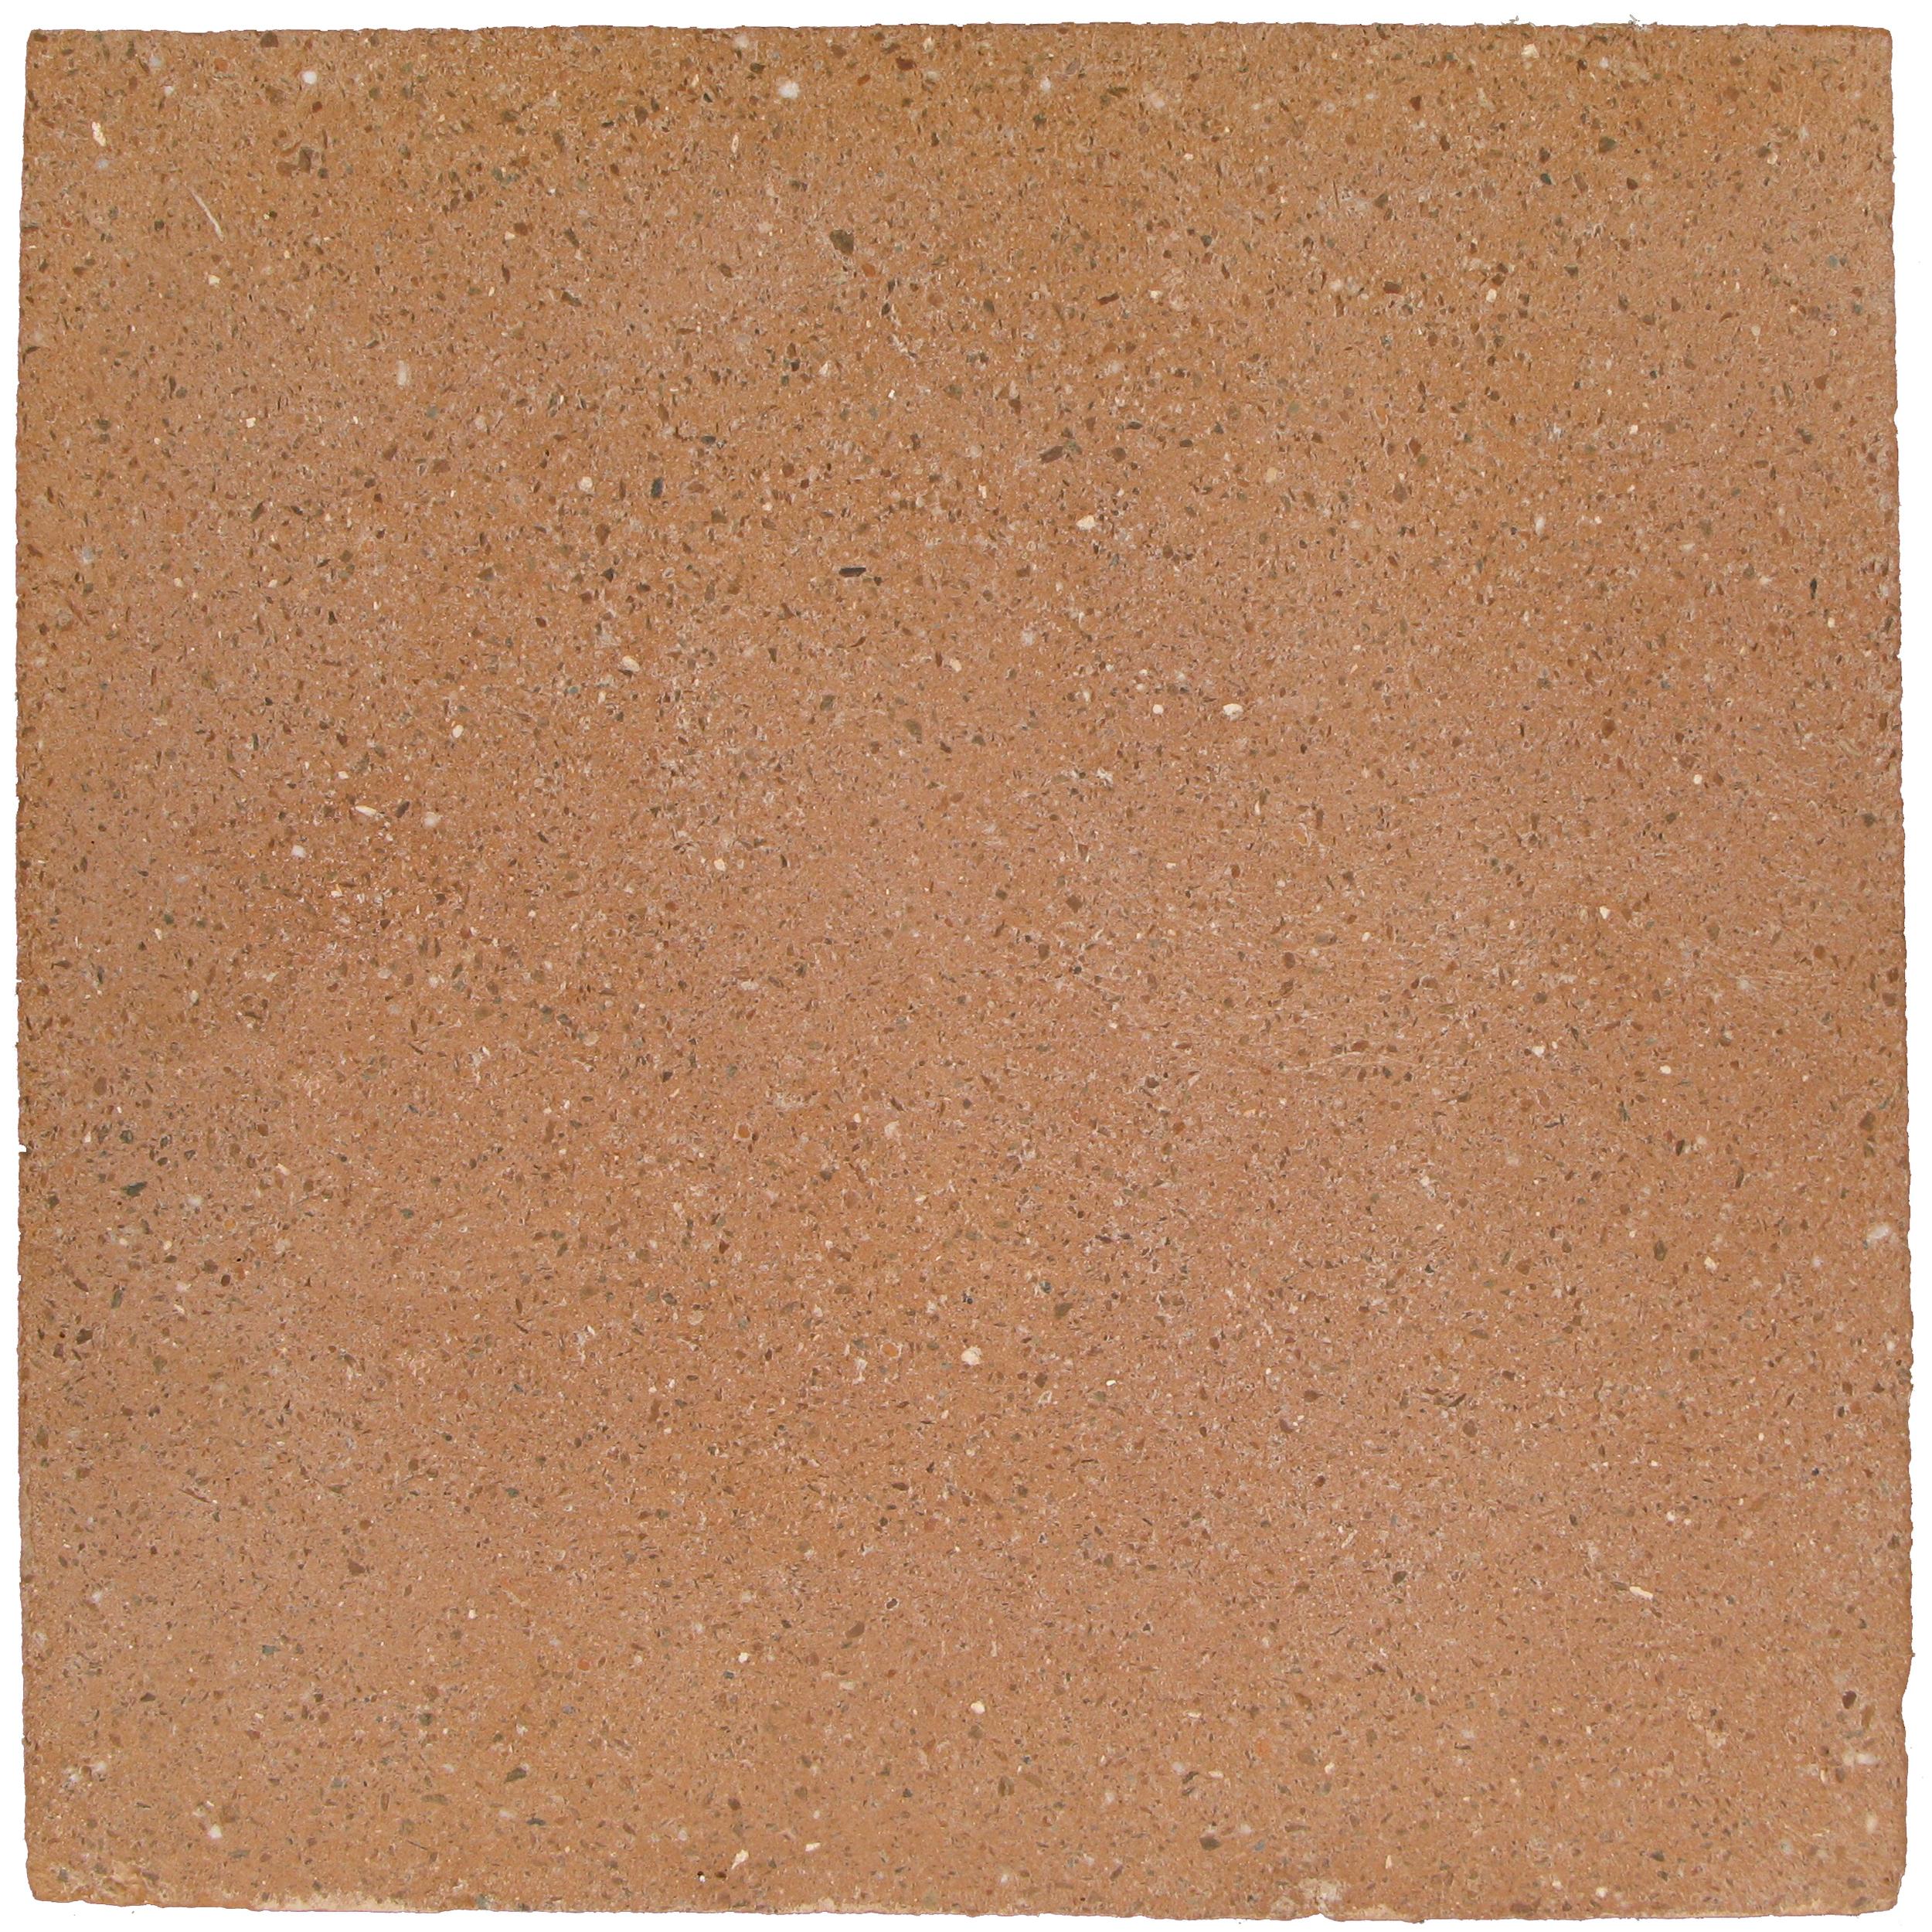 Square9x9-2.jpg